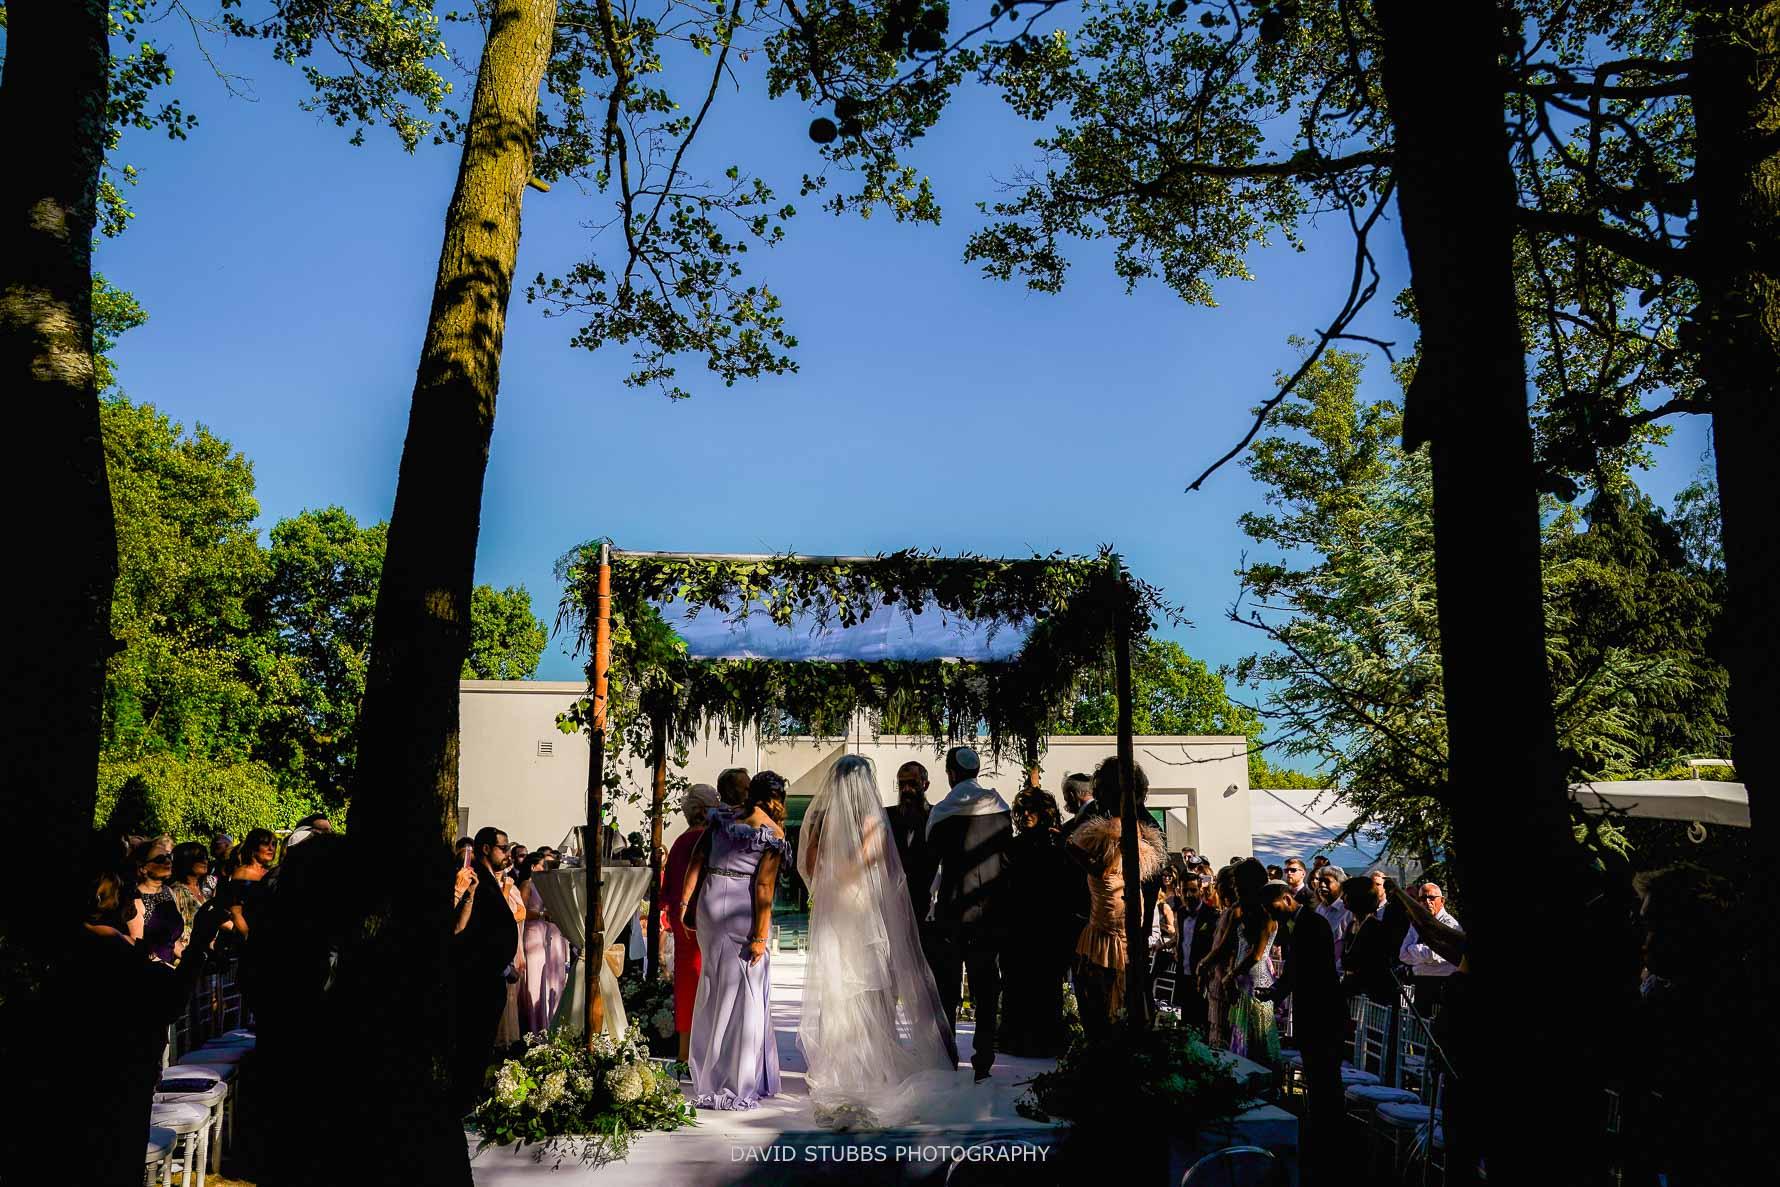 outside chuppah for the wedding